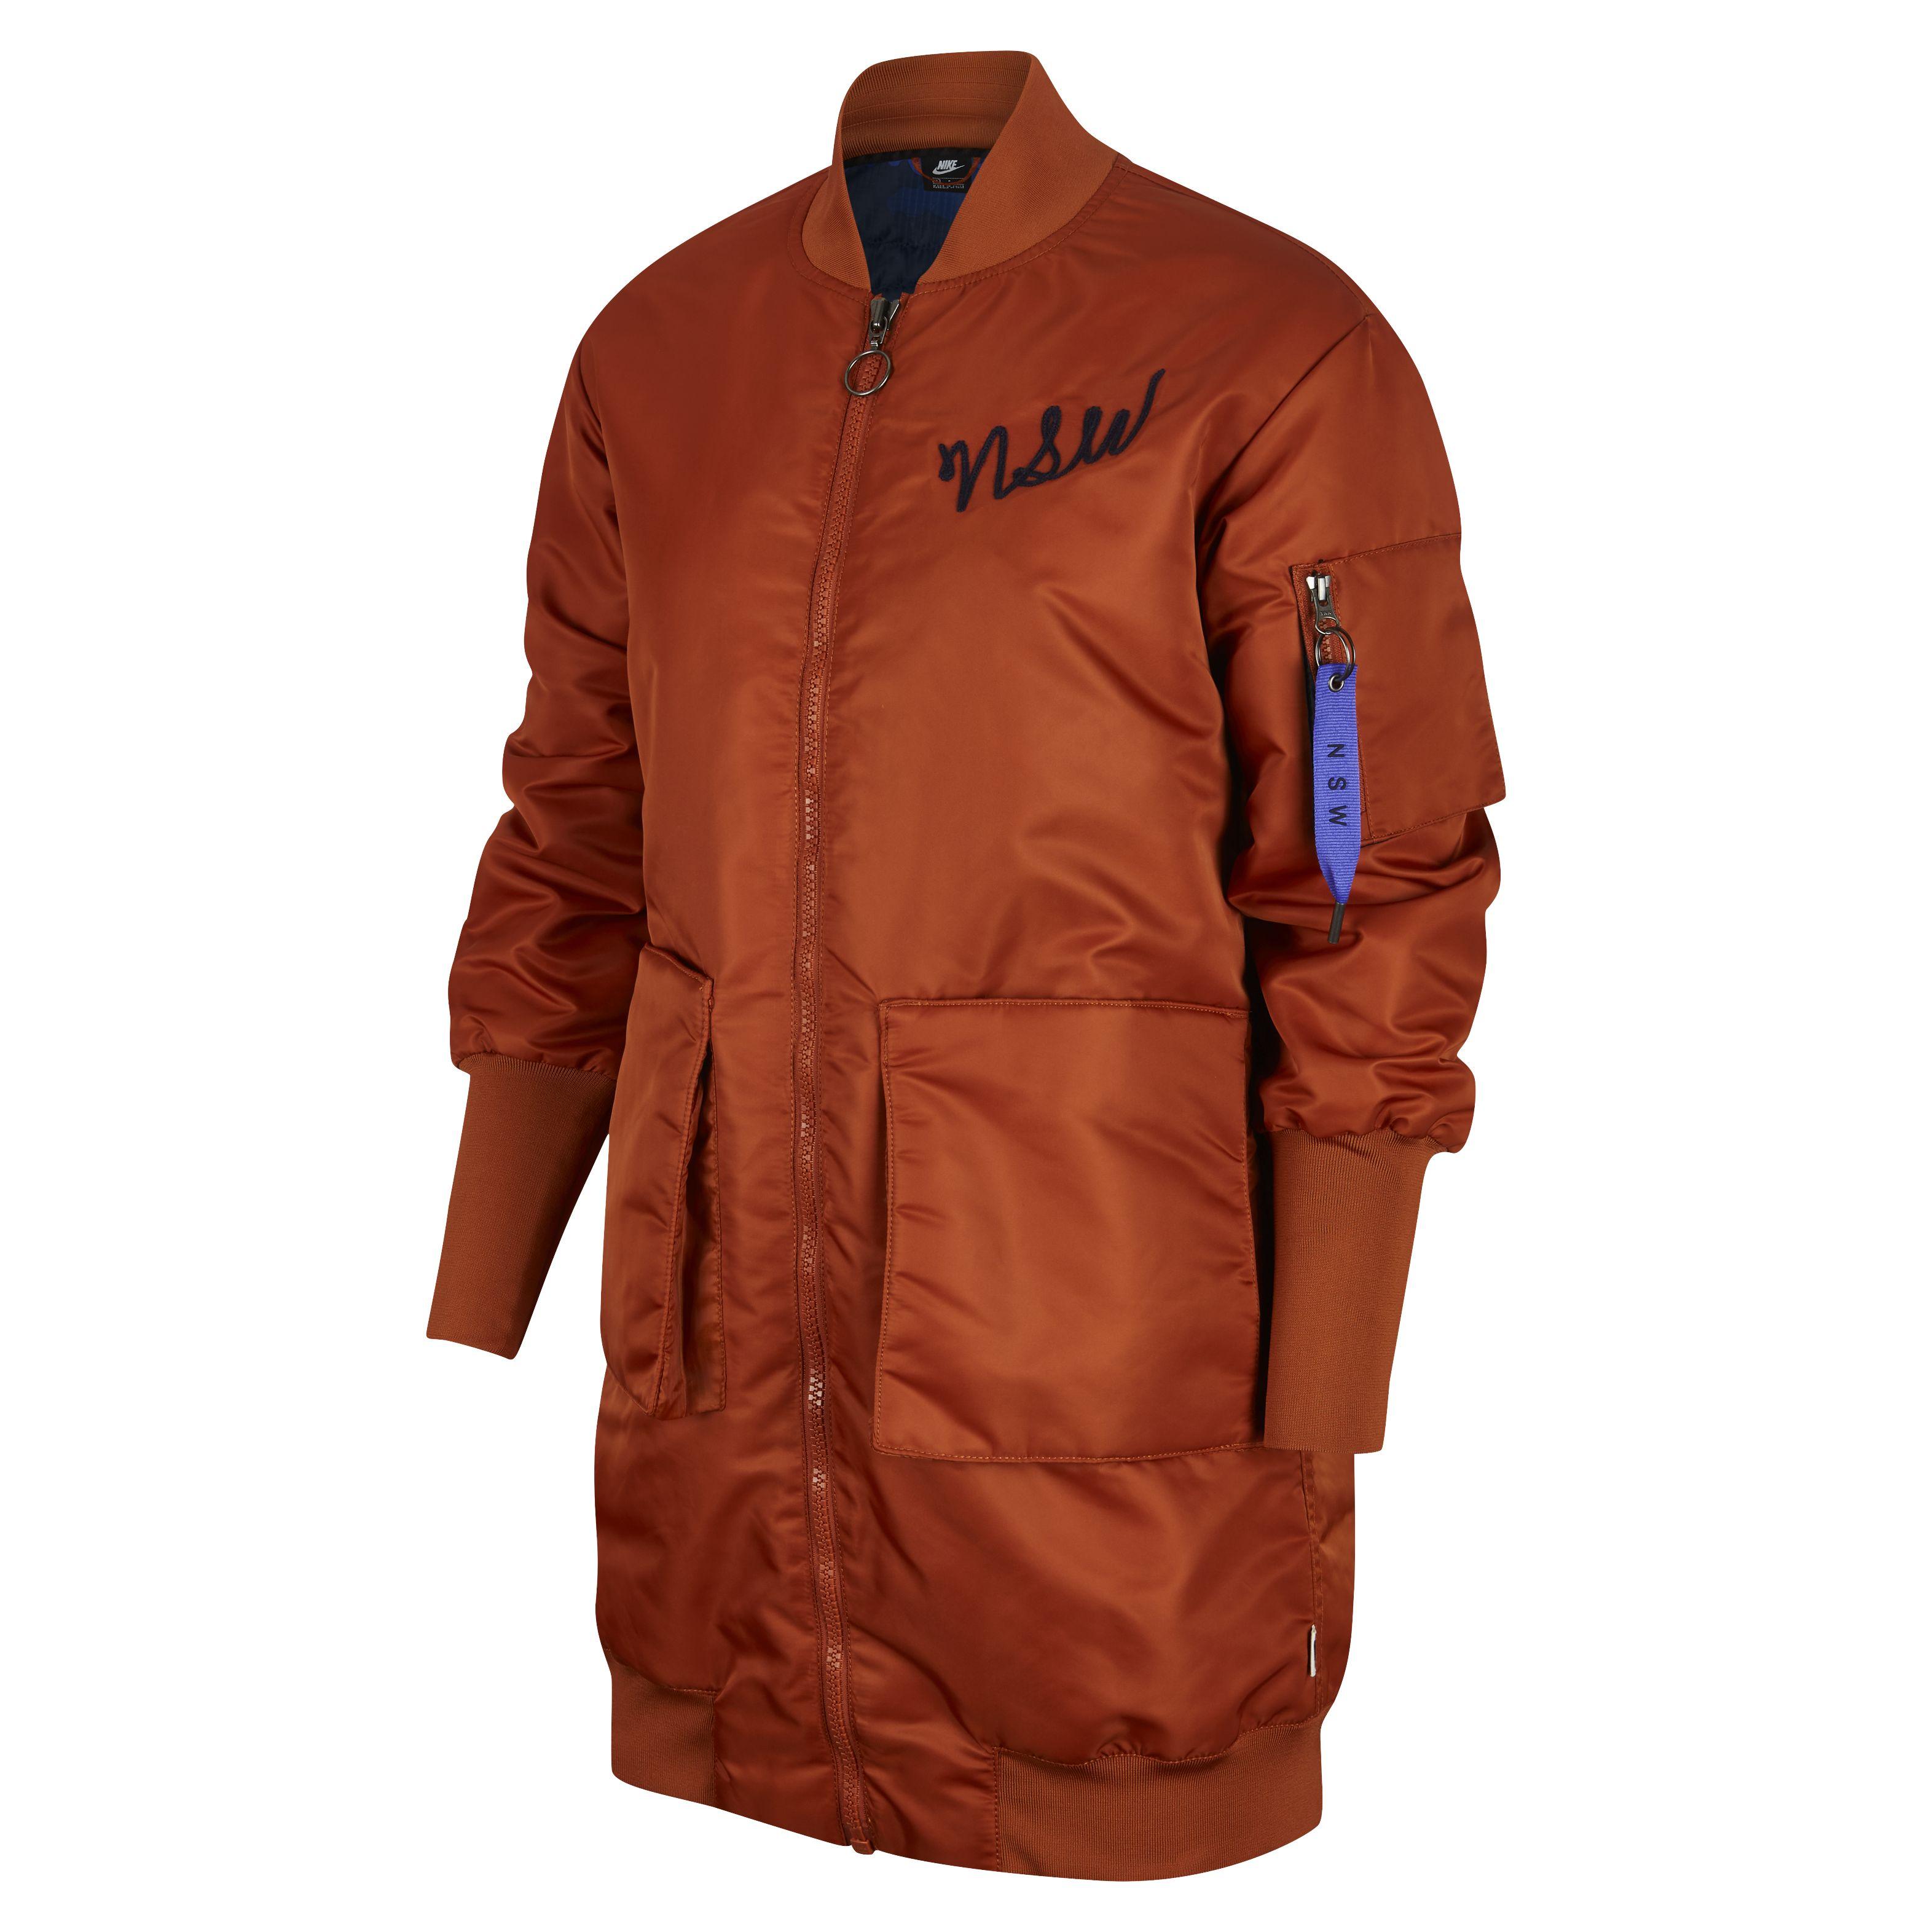 863462e0 Женская куртка Nike Sportswear Parka Insulated MA1 Dark Russet - фото 1